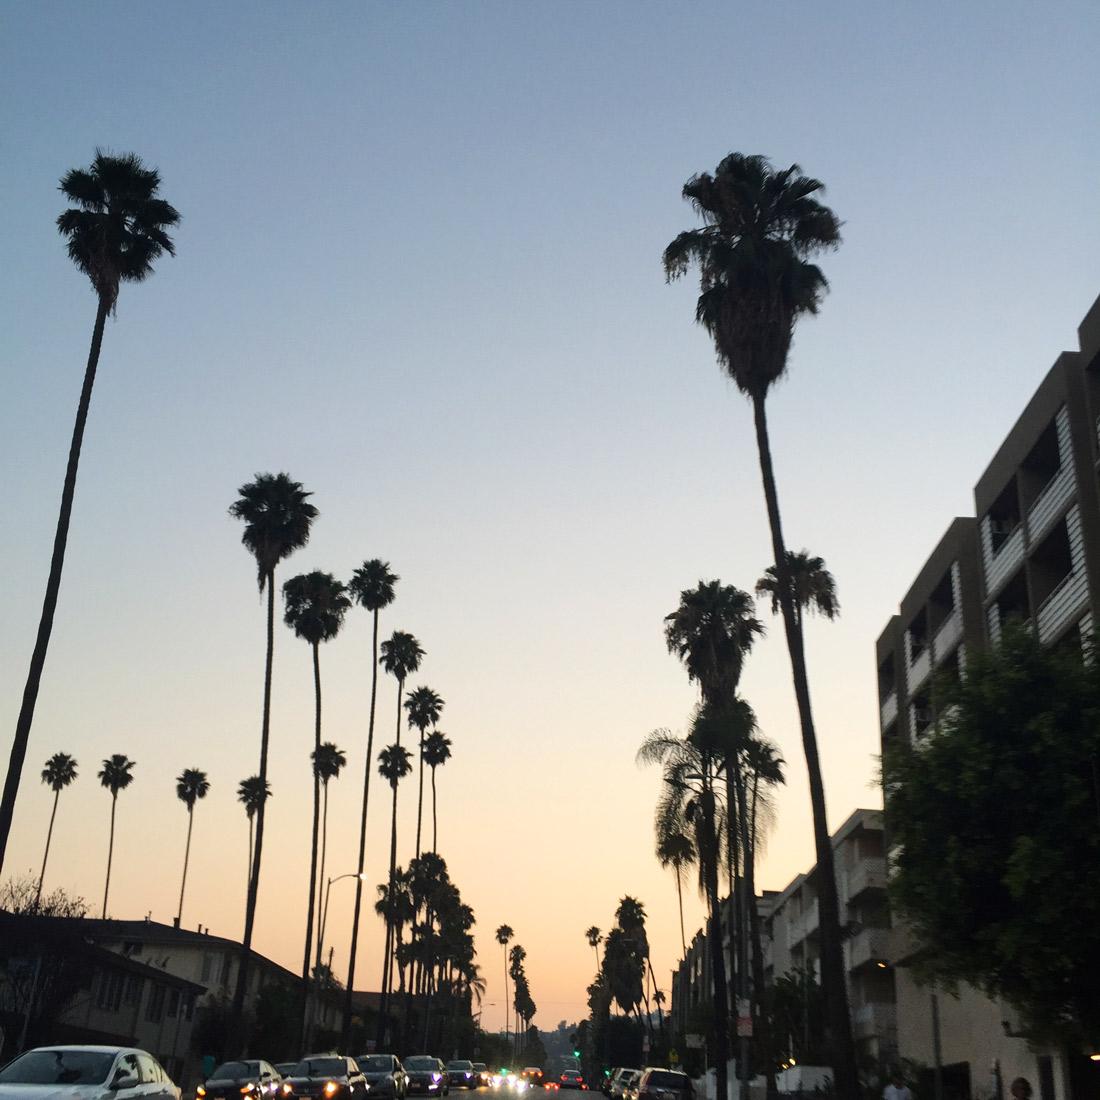 Bag-at-you---Travel-blog---Sunset-Hollywood-Los-Angeles